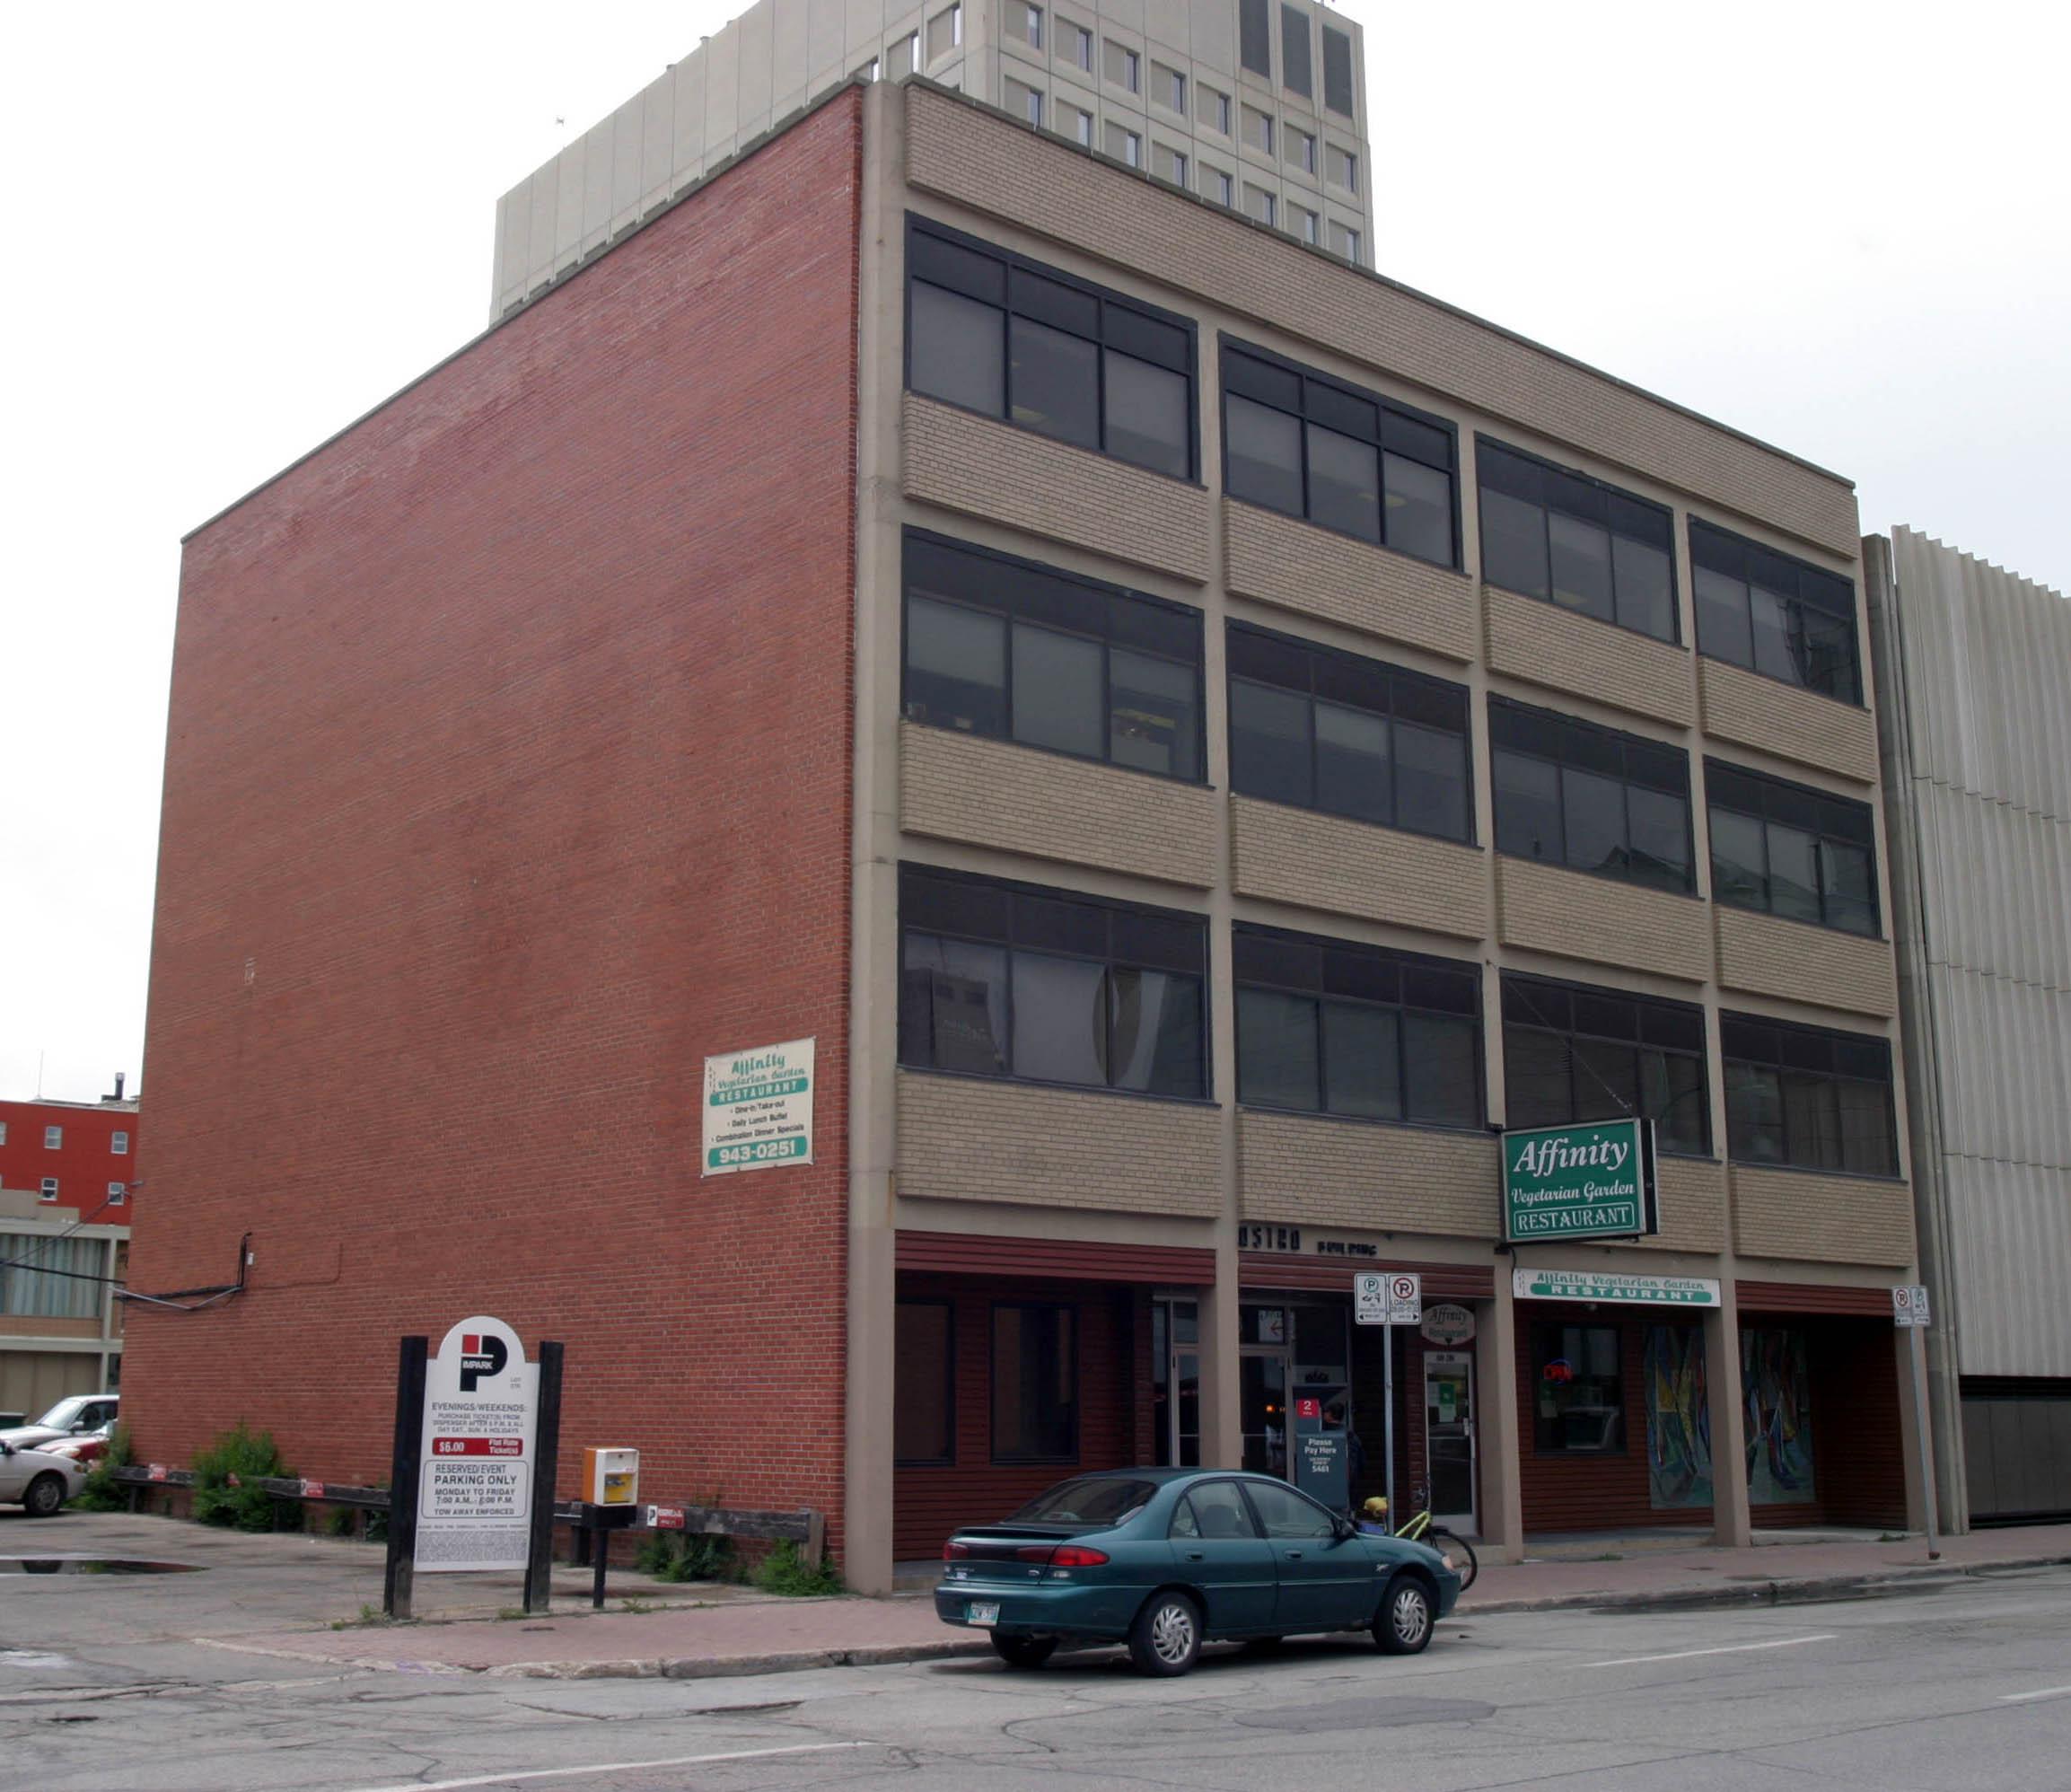 Top 90 Healthcare Architecture Firms Building Design: Winnipeg Architecture Foundation